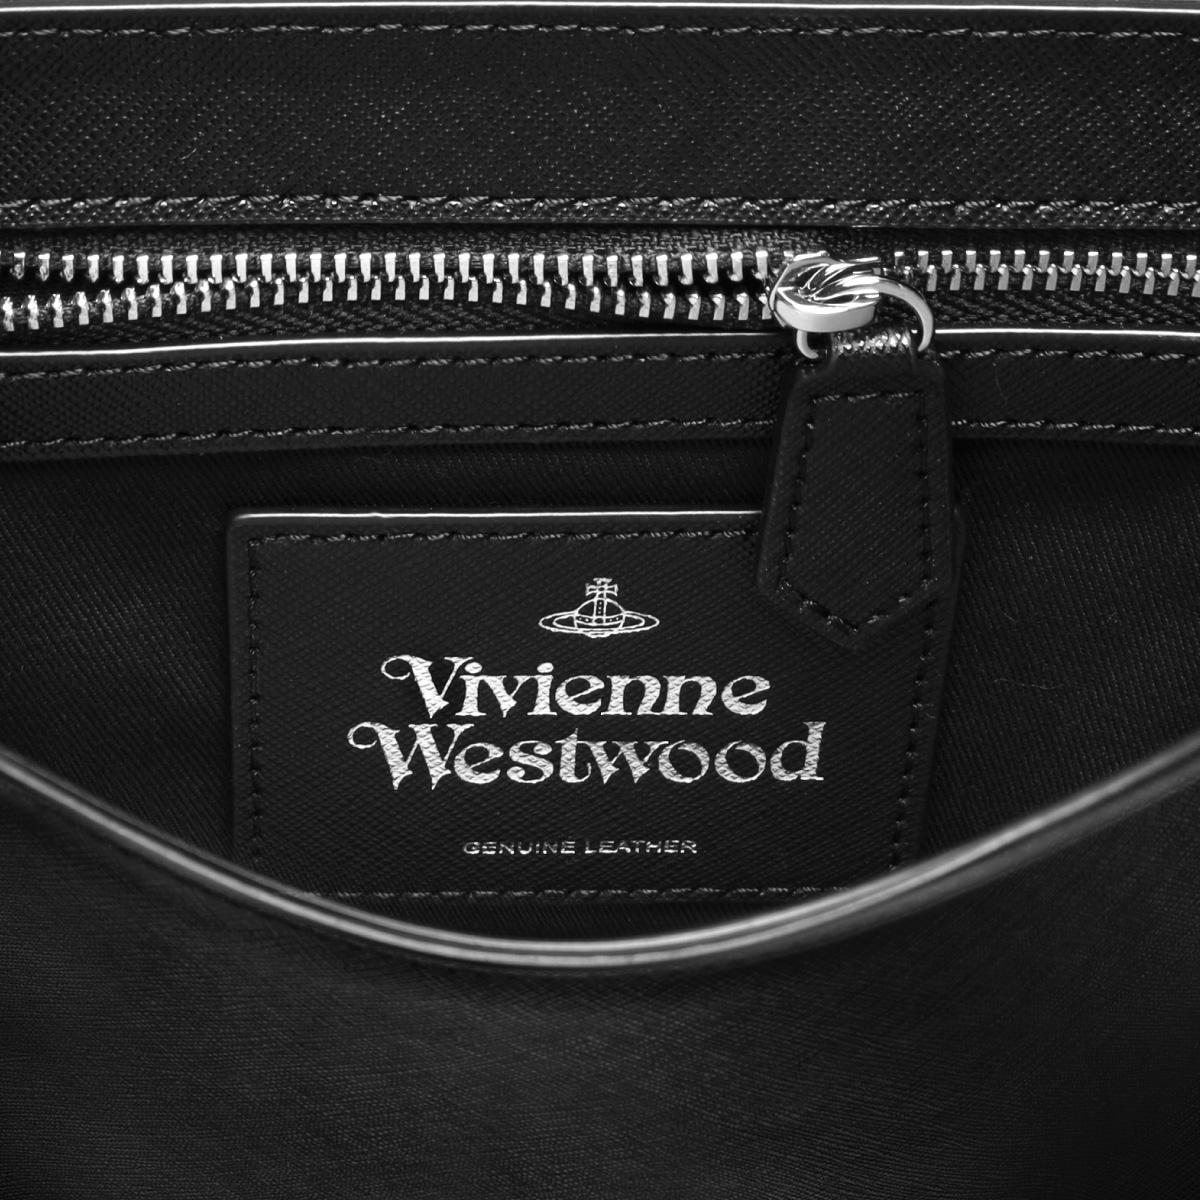 VIVIENNE WESTWOOD ヴィヴィアン ウエストウッド | ショルダーバッグ ミディアム | DEBBIE デビー